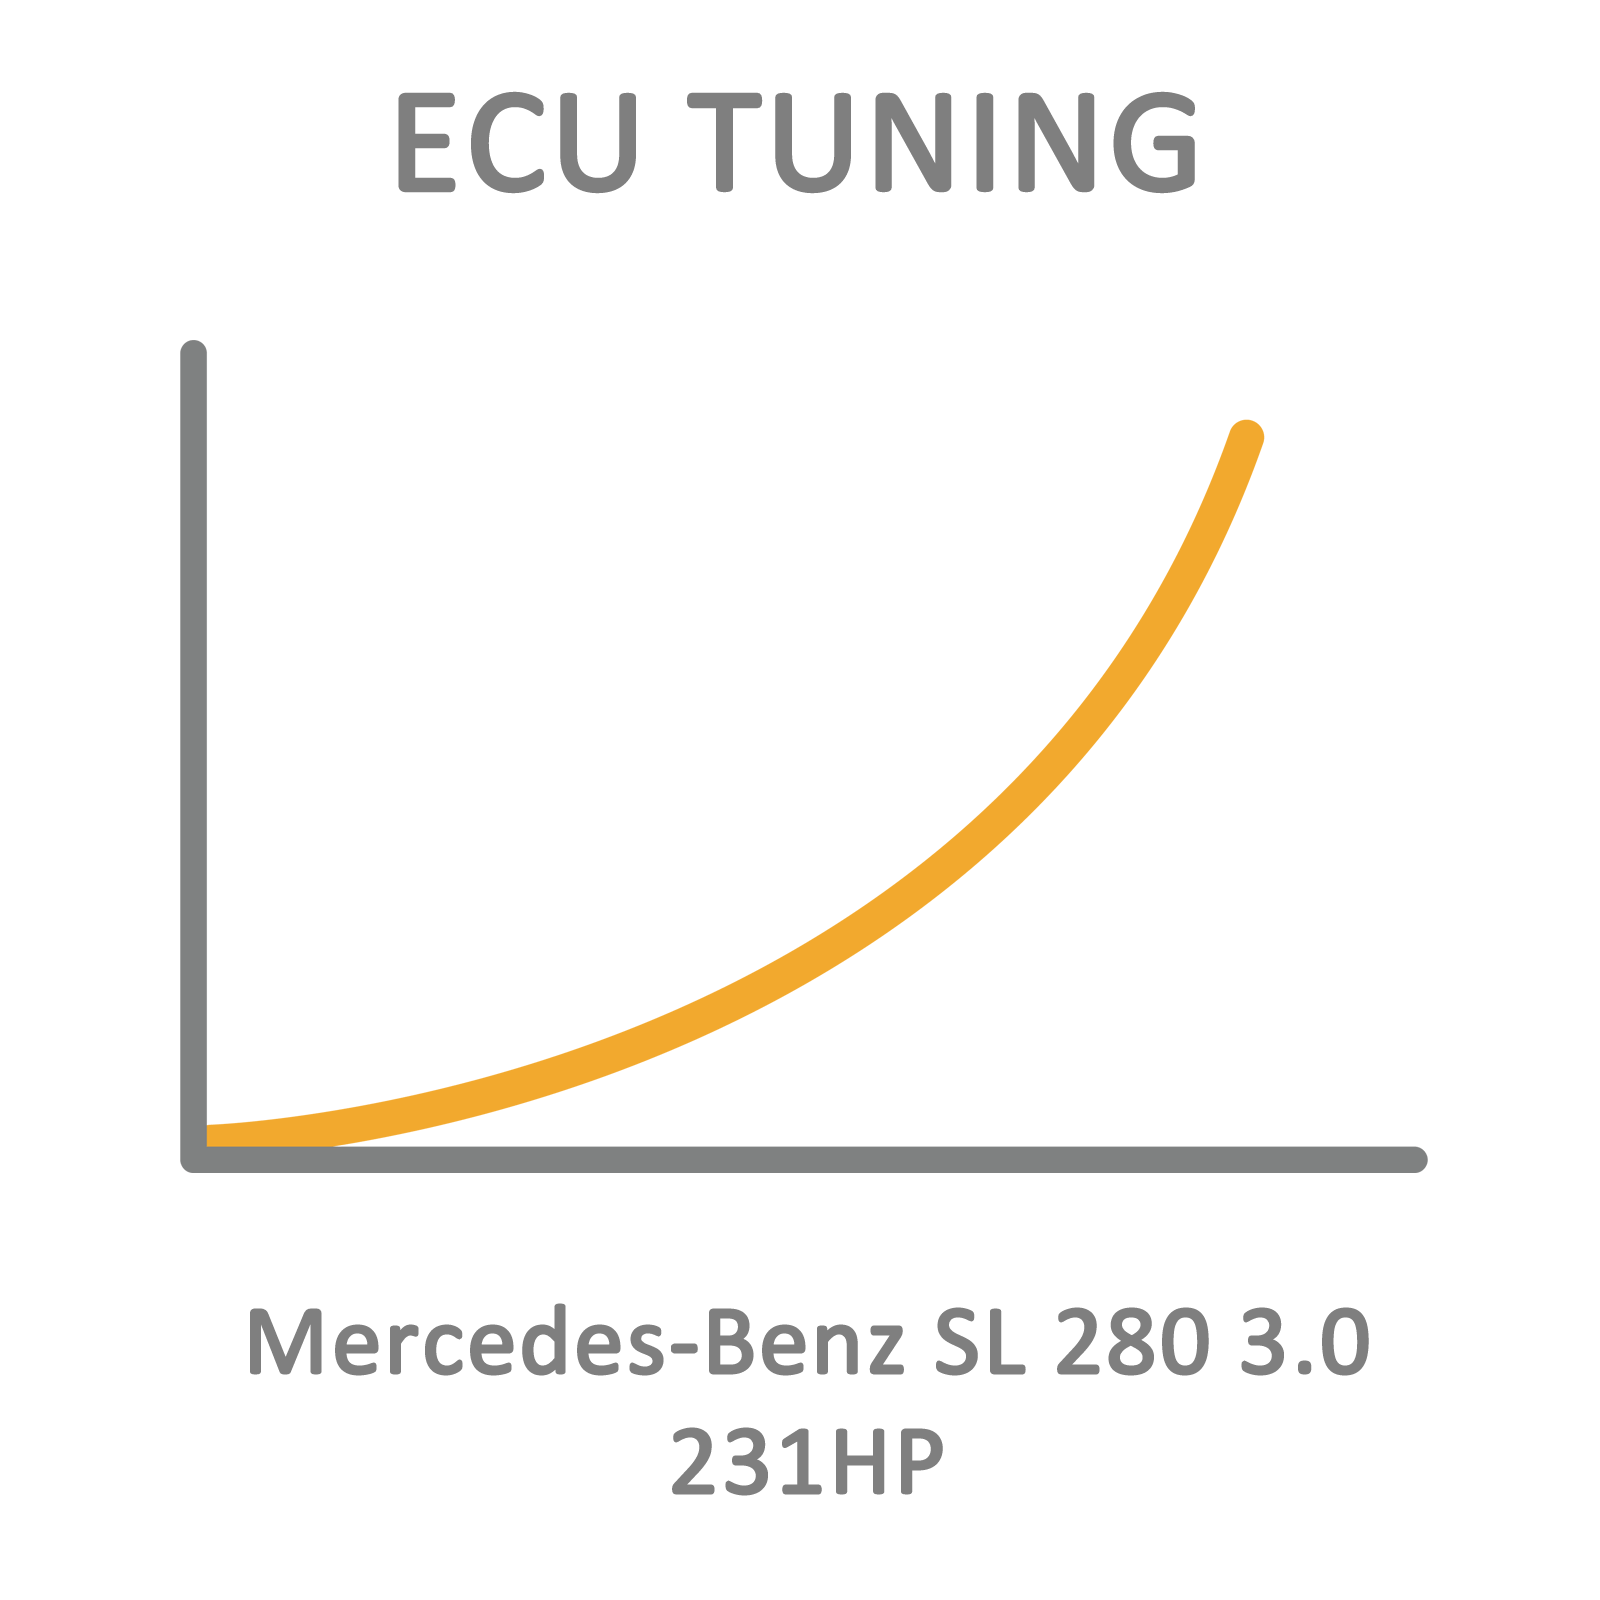 Mercedes-Benz SL 280 3.0 231HP ECU Tuning Remapping